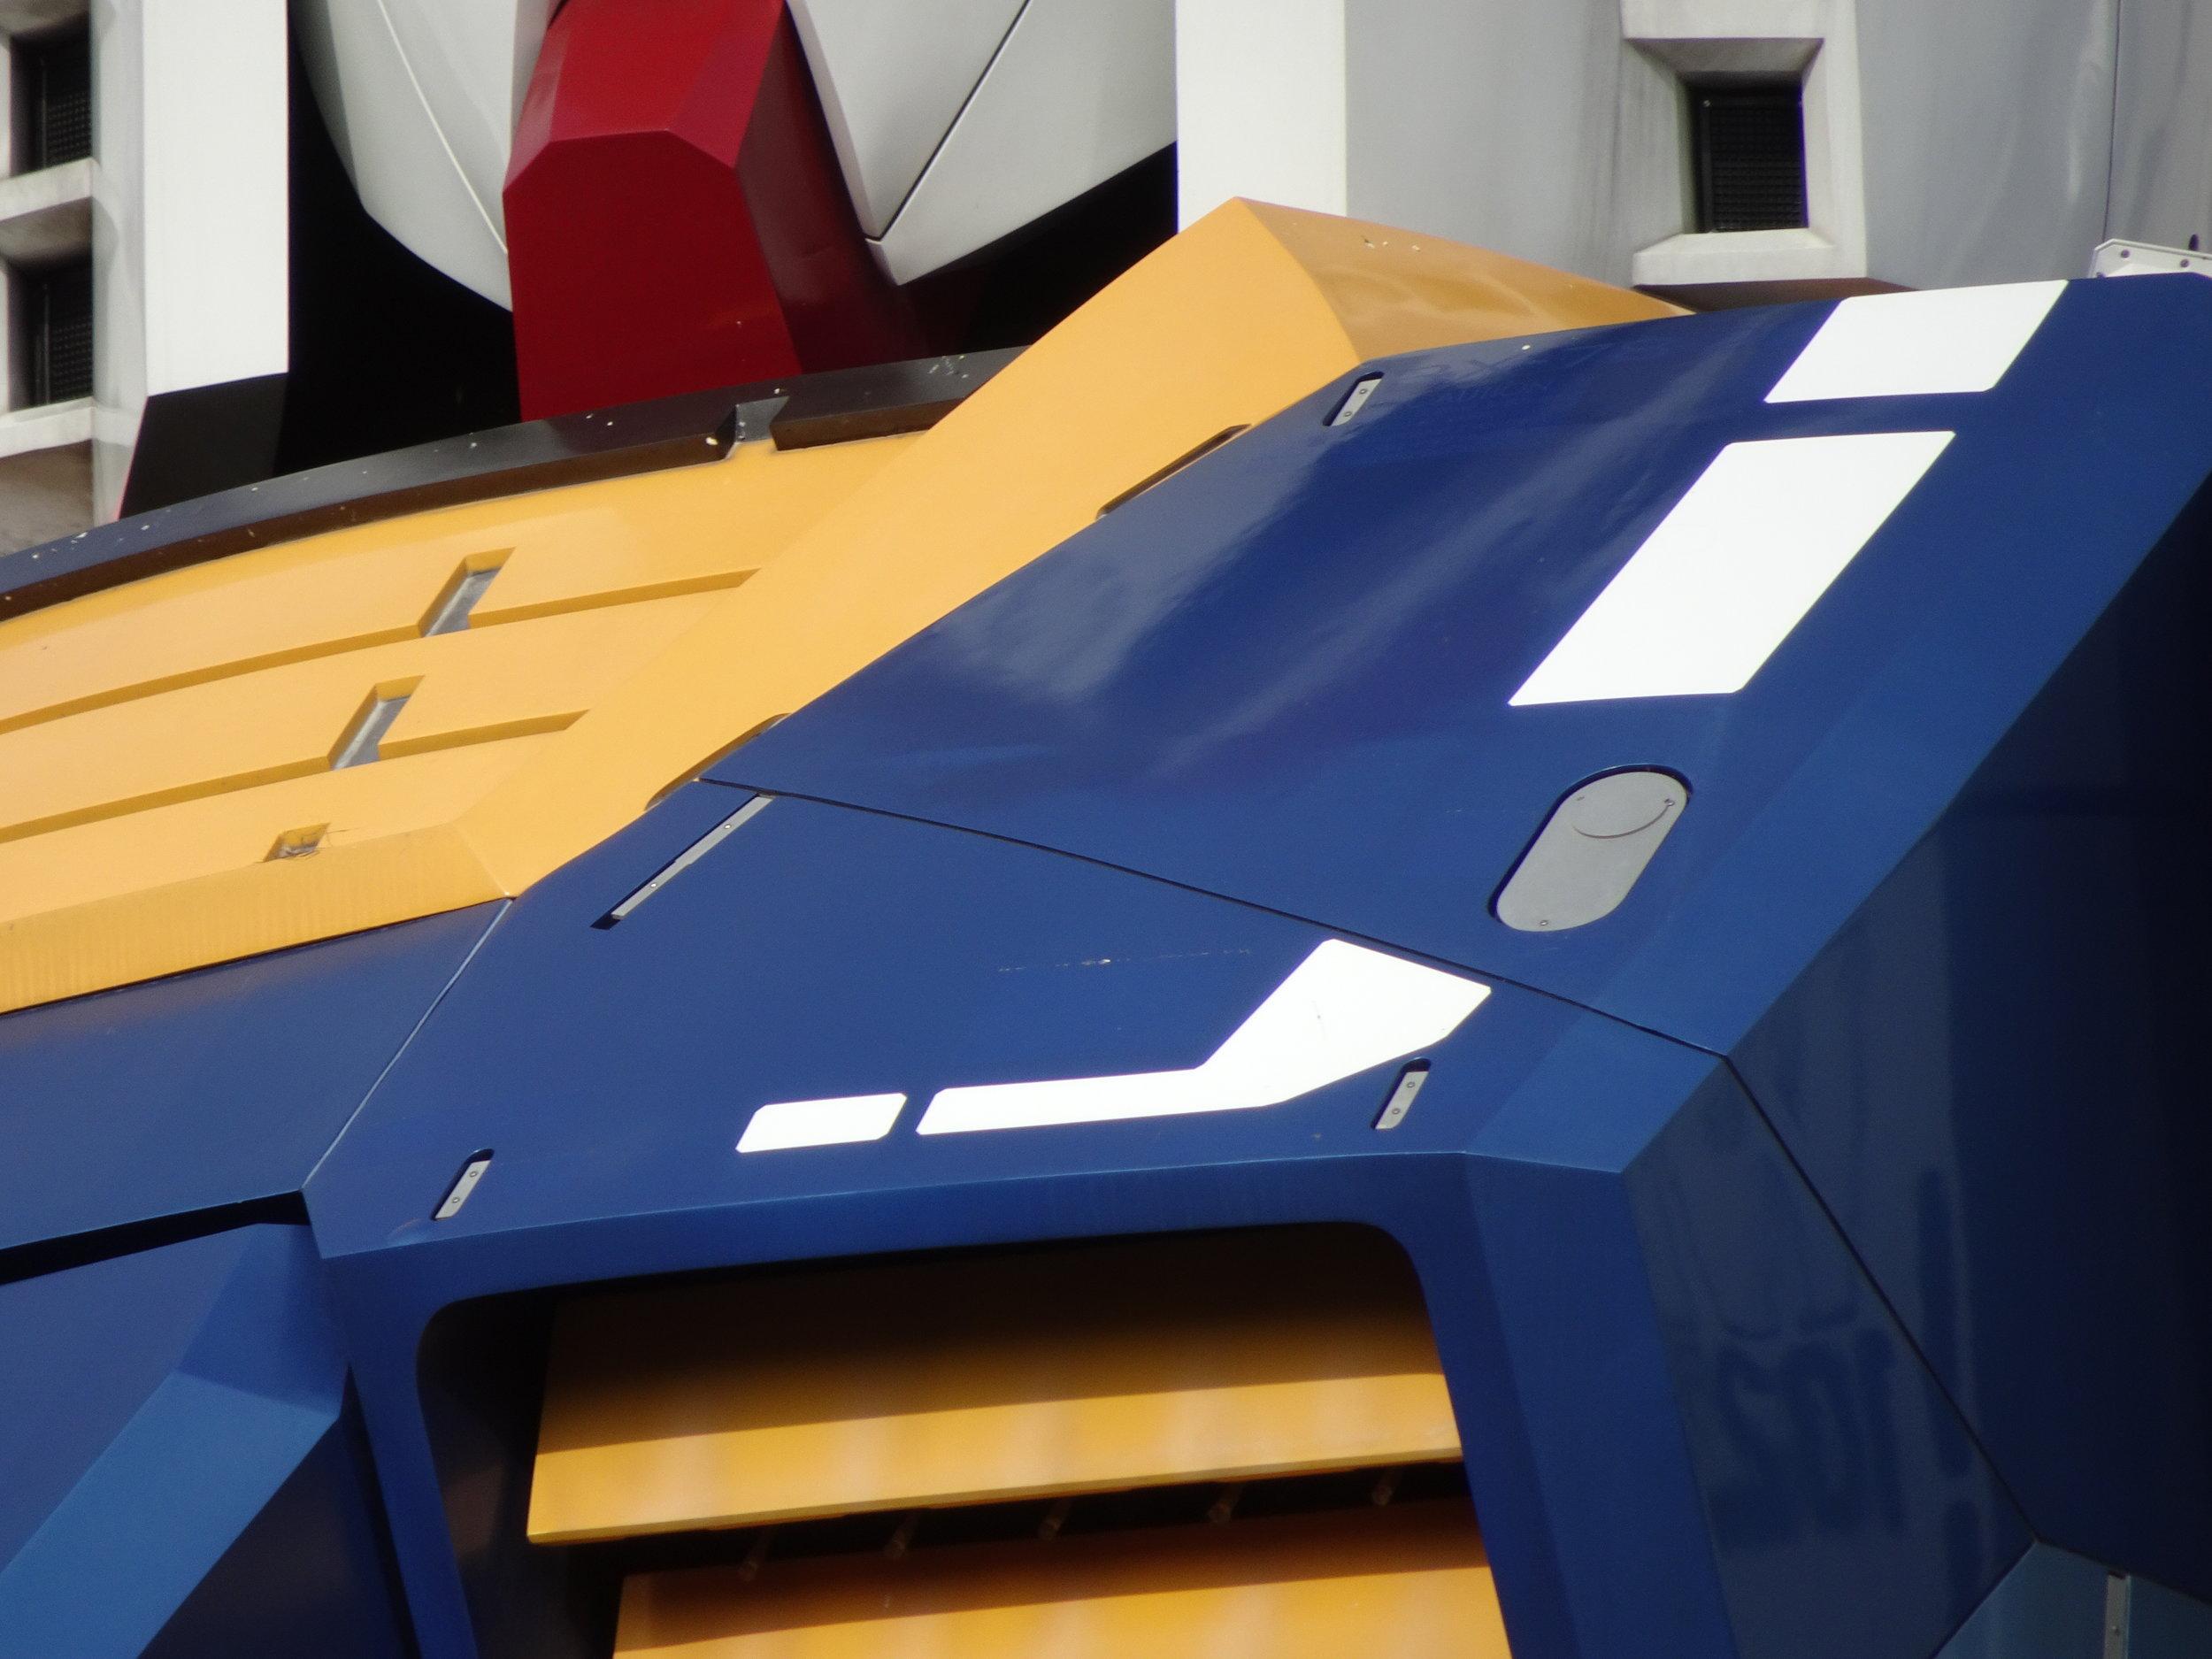 RX-78-2 Gundam 1-1 Statue - 084.jpg